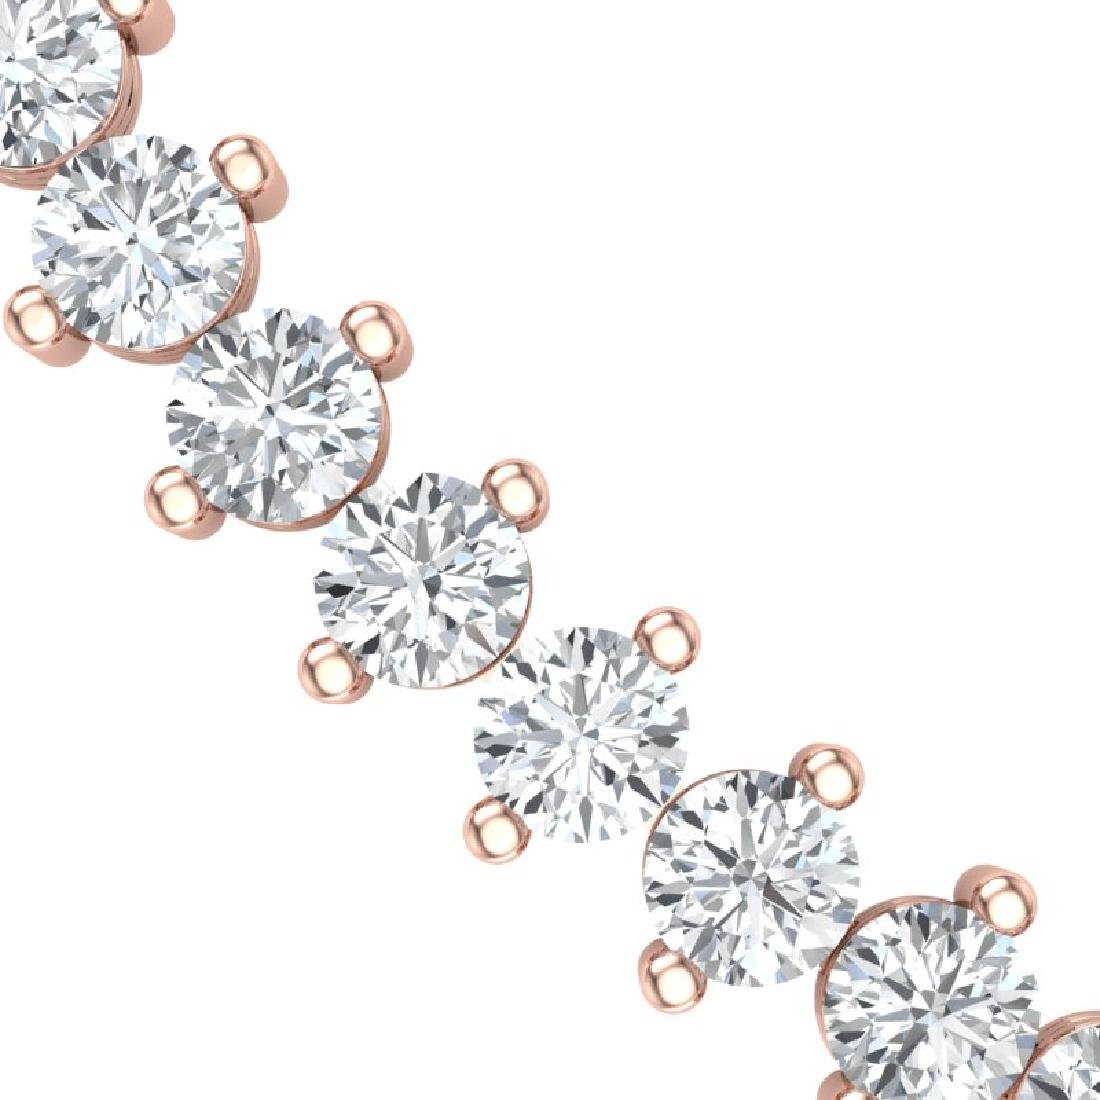 20 CTW Certified VS/SI Diamond Necklace 18K Rose Gold - 2